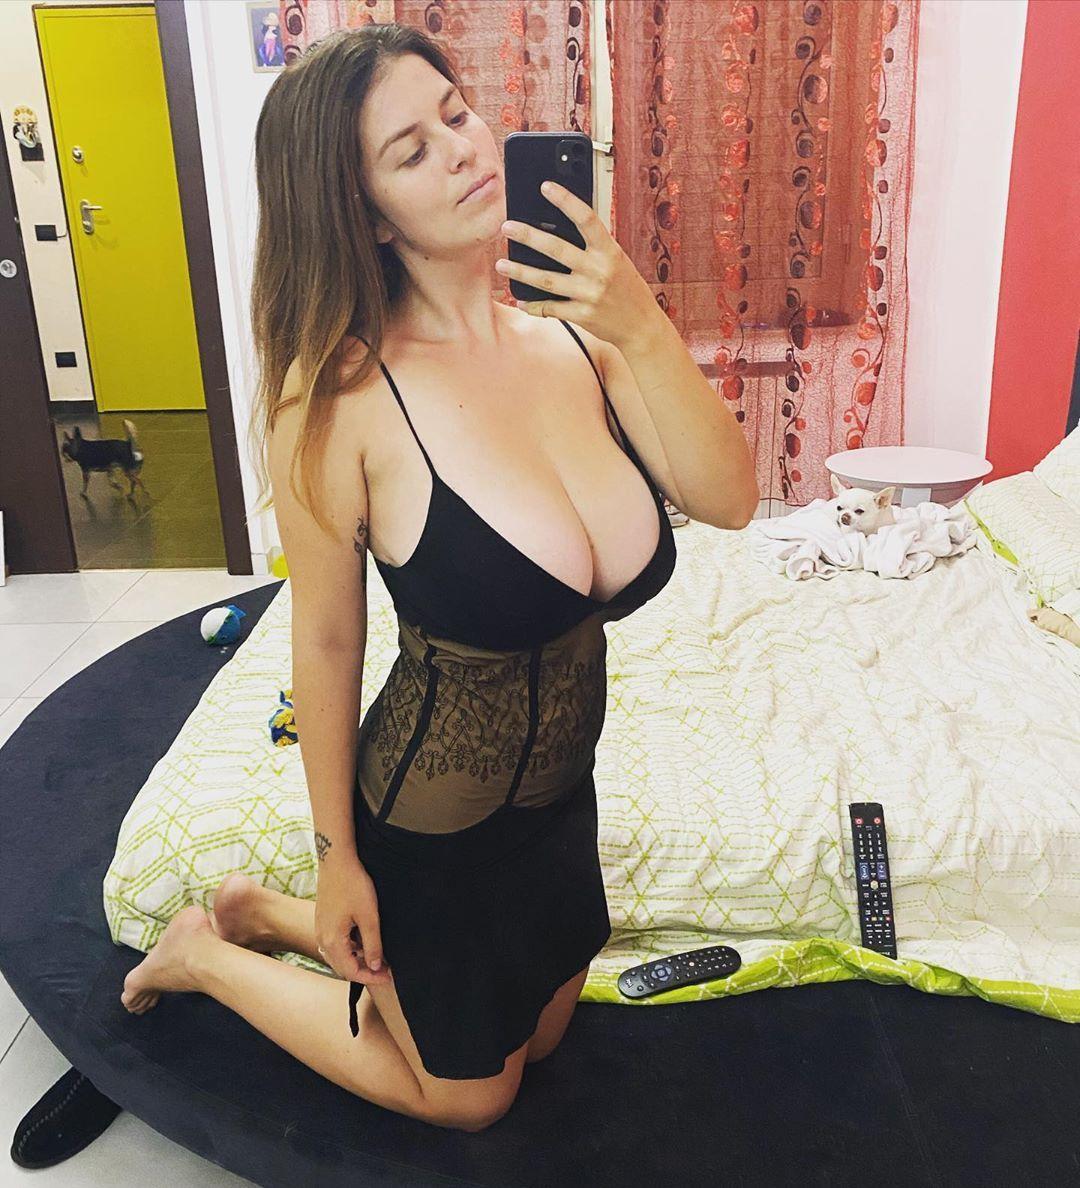 44 3k Likes 1 494 Comments Mădălina Ioana Filip Mady Gio On Instagram Good Night My Friends Mady Home Bad N In 2020 Good Night My Friend Women Fashion